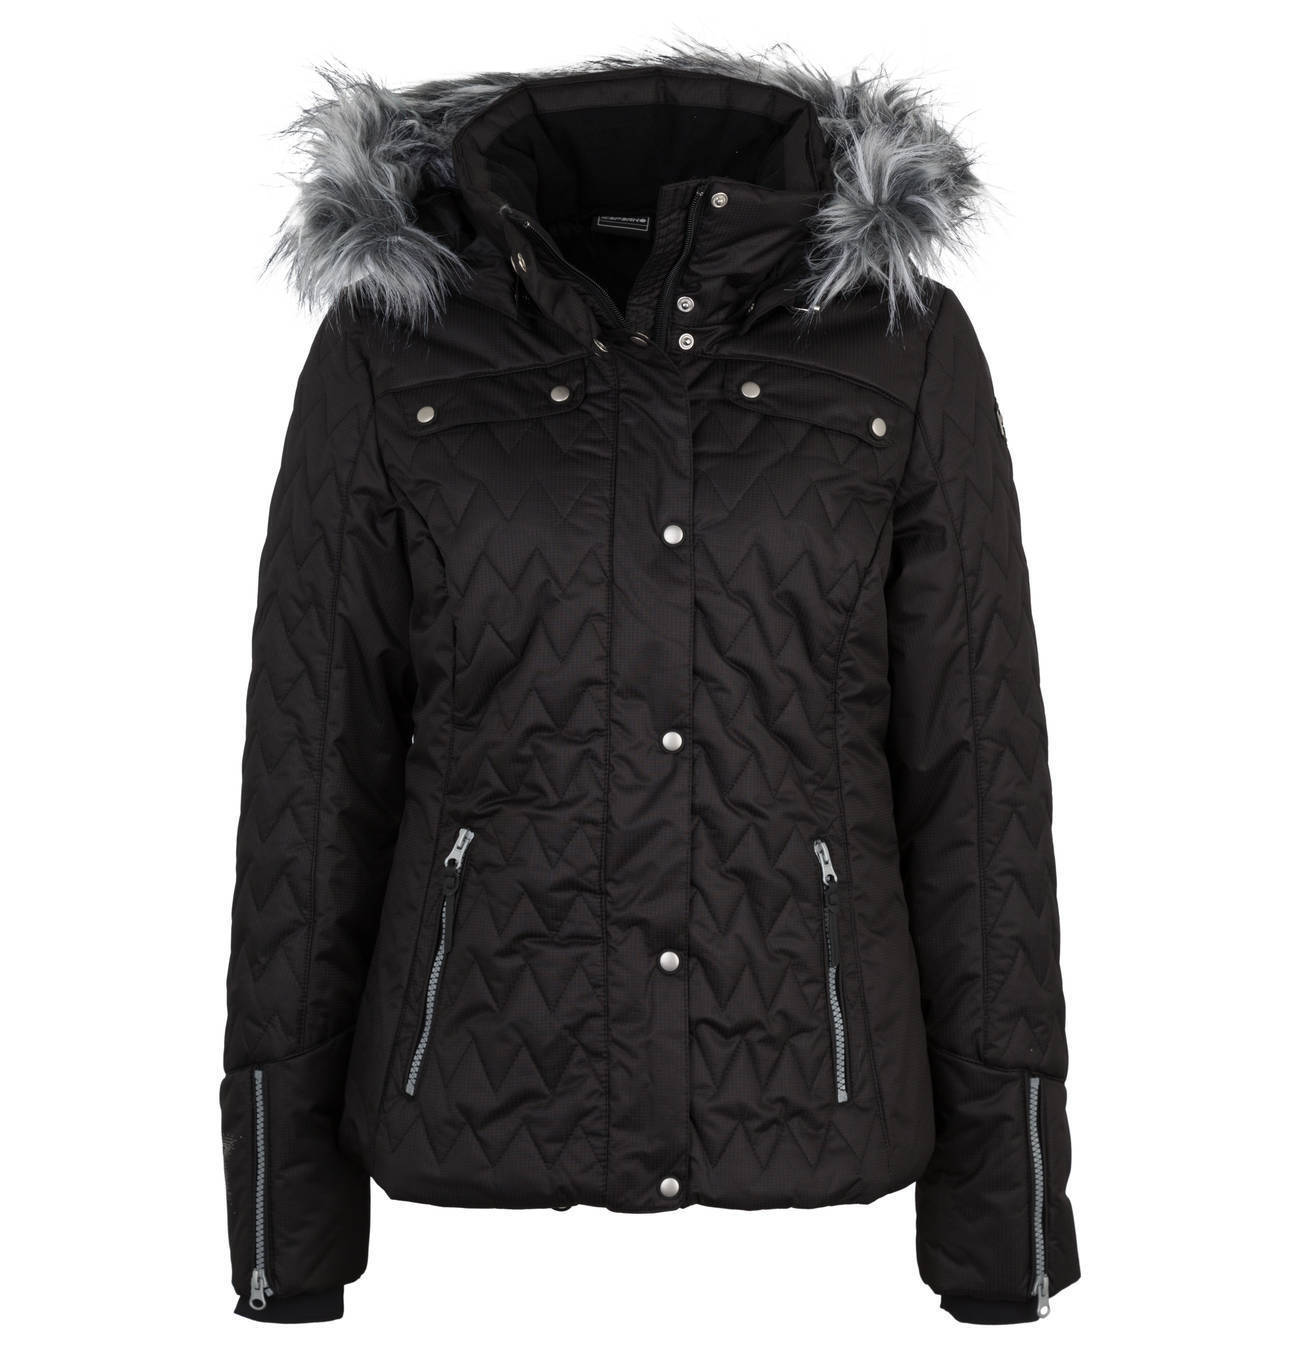 Icepeak Yuuna Kunstpelzkragen Skijacke Damen Damen Damen schwarz  149 99 867c7d